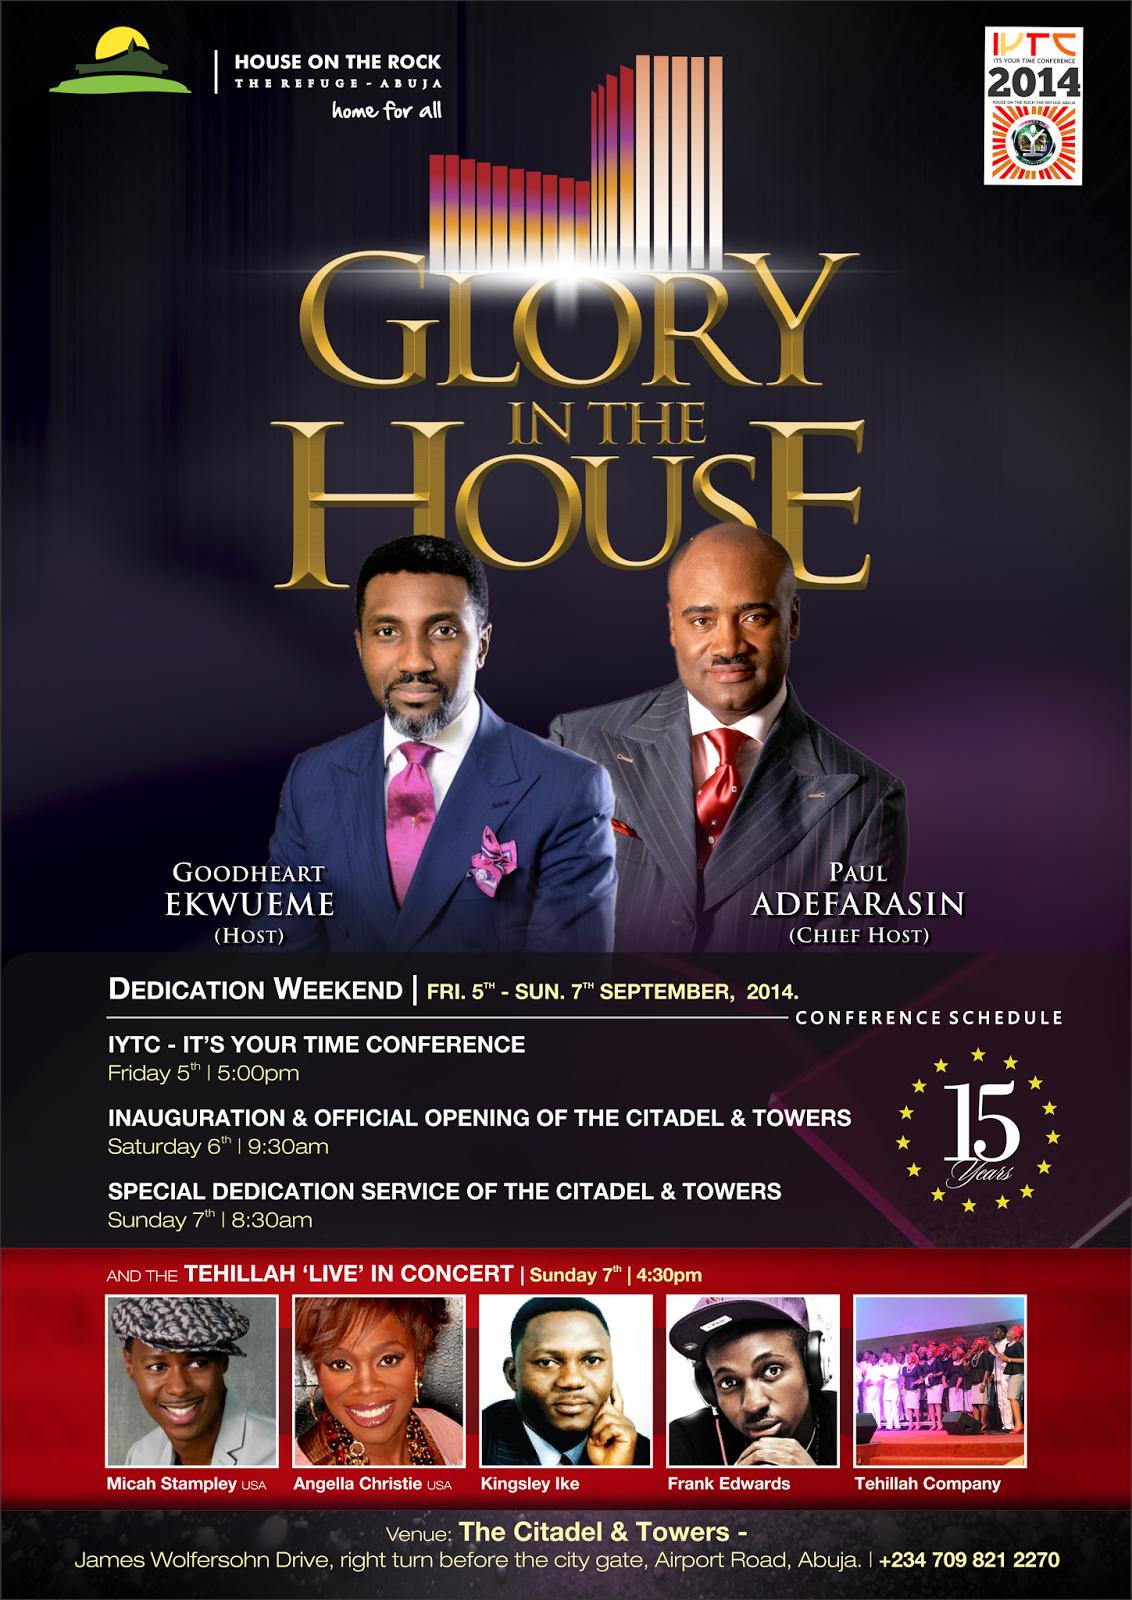 NaijaCynth's Blog: Its Your Time Conference 2014: Citadel & Towers Dedication & Tehillah Company Live Concert